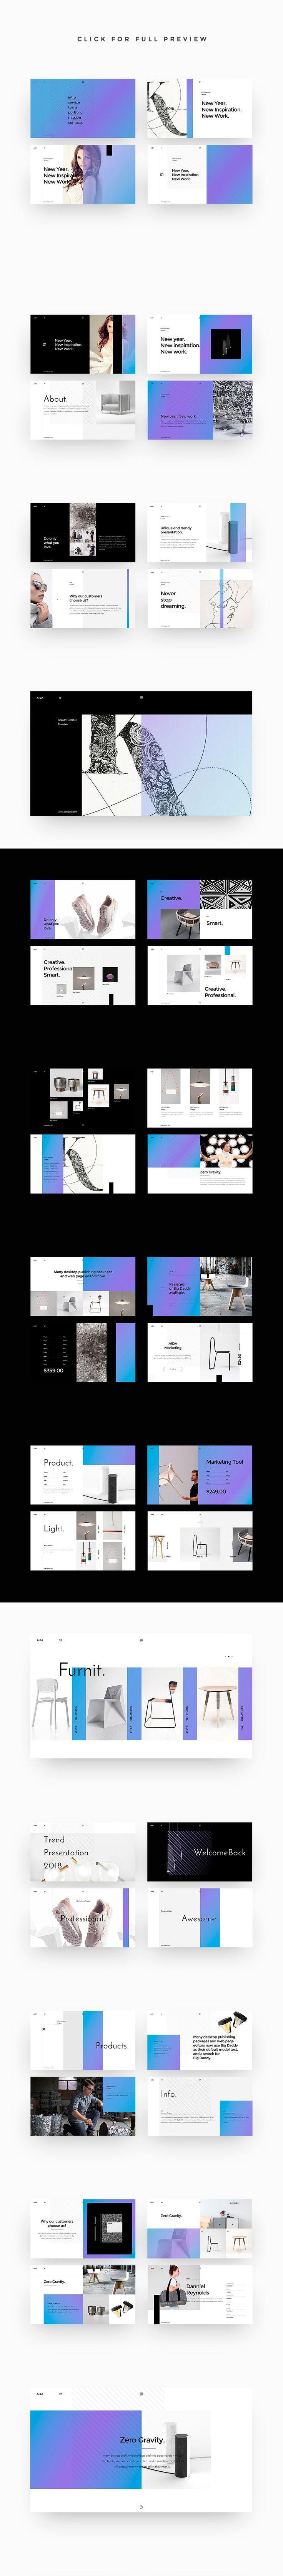 AIDA Powerpoint Template + Bonus #presentation #ppt #pptx #powerpoint #template